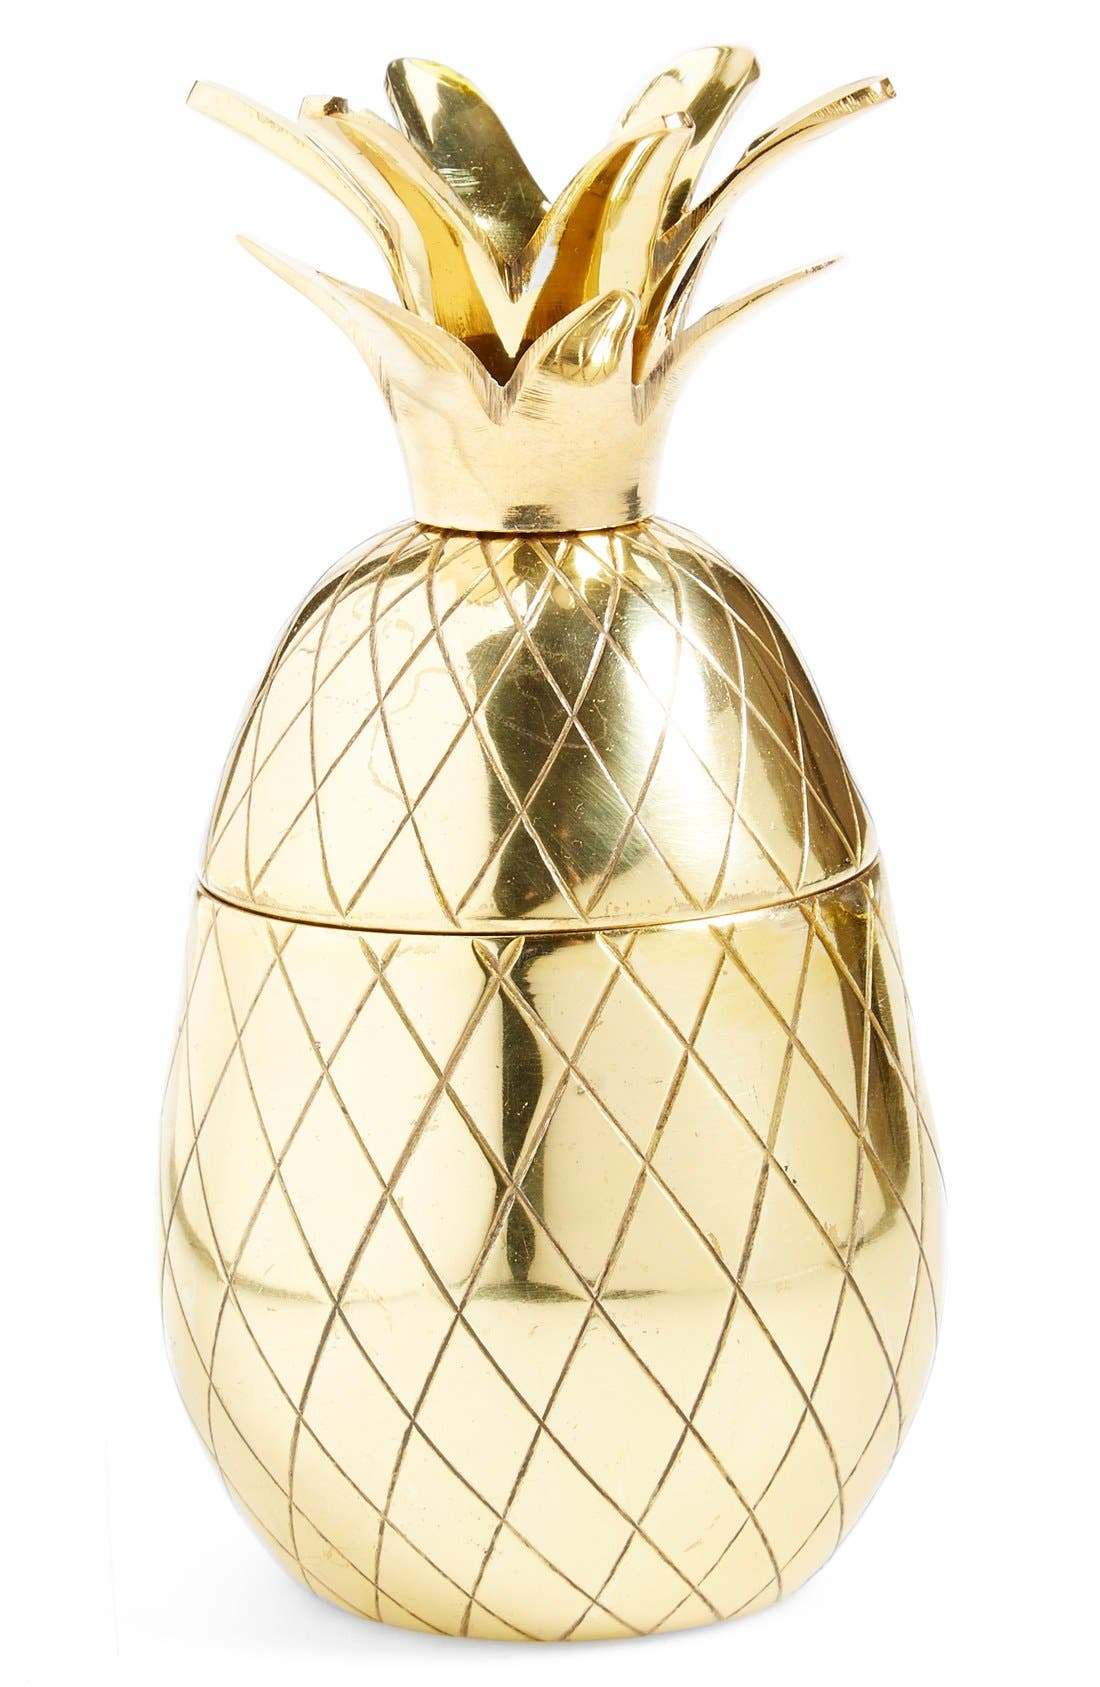 Alternate Image 1 Selected - W&P DESIGN Pineapple Tumbler